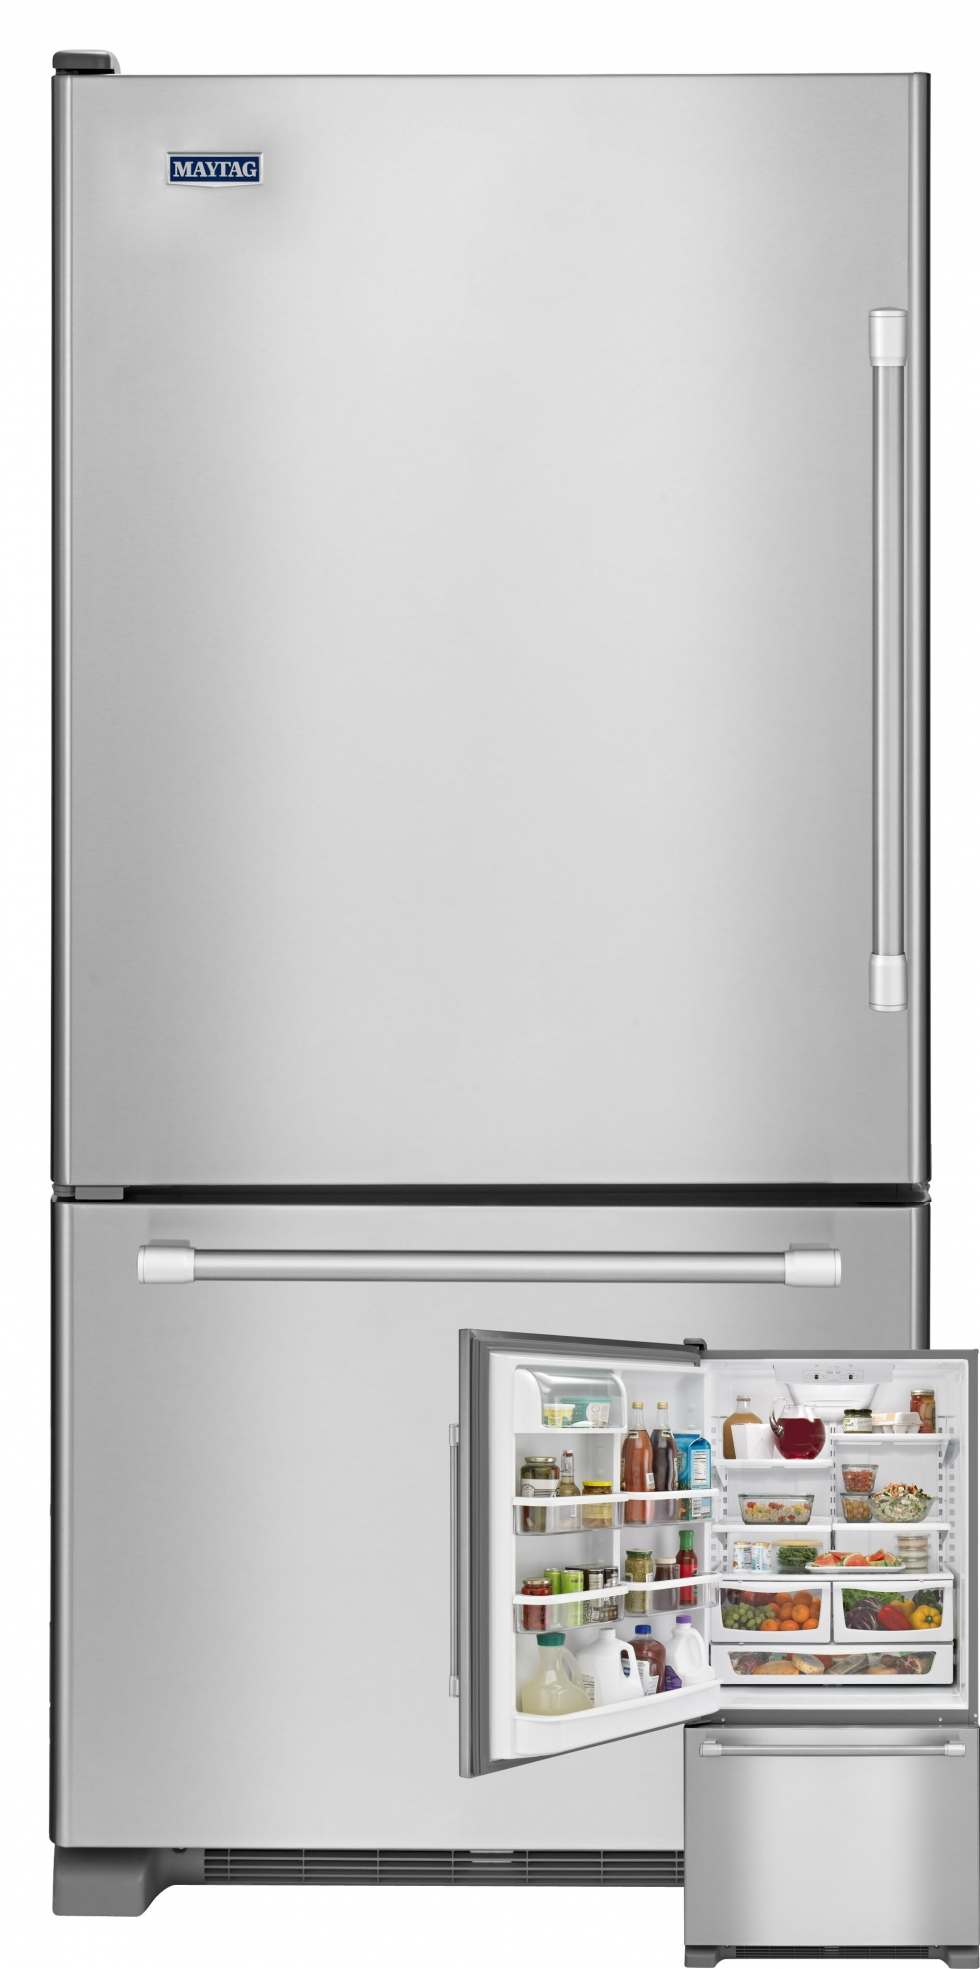 Maytag Bottom Freezer Refrigerator Stainless Steel Start